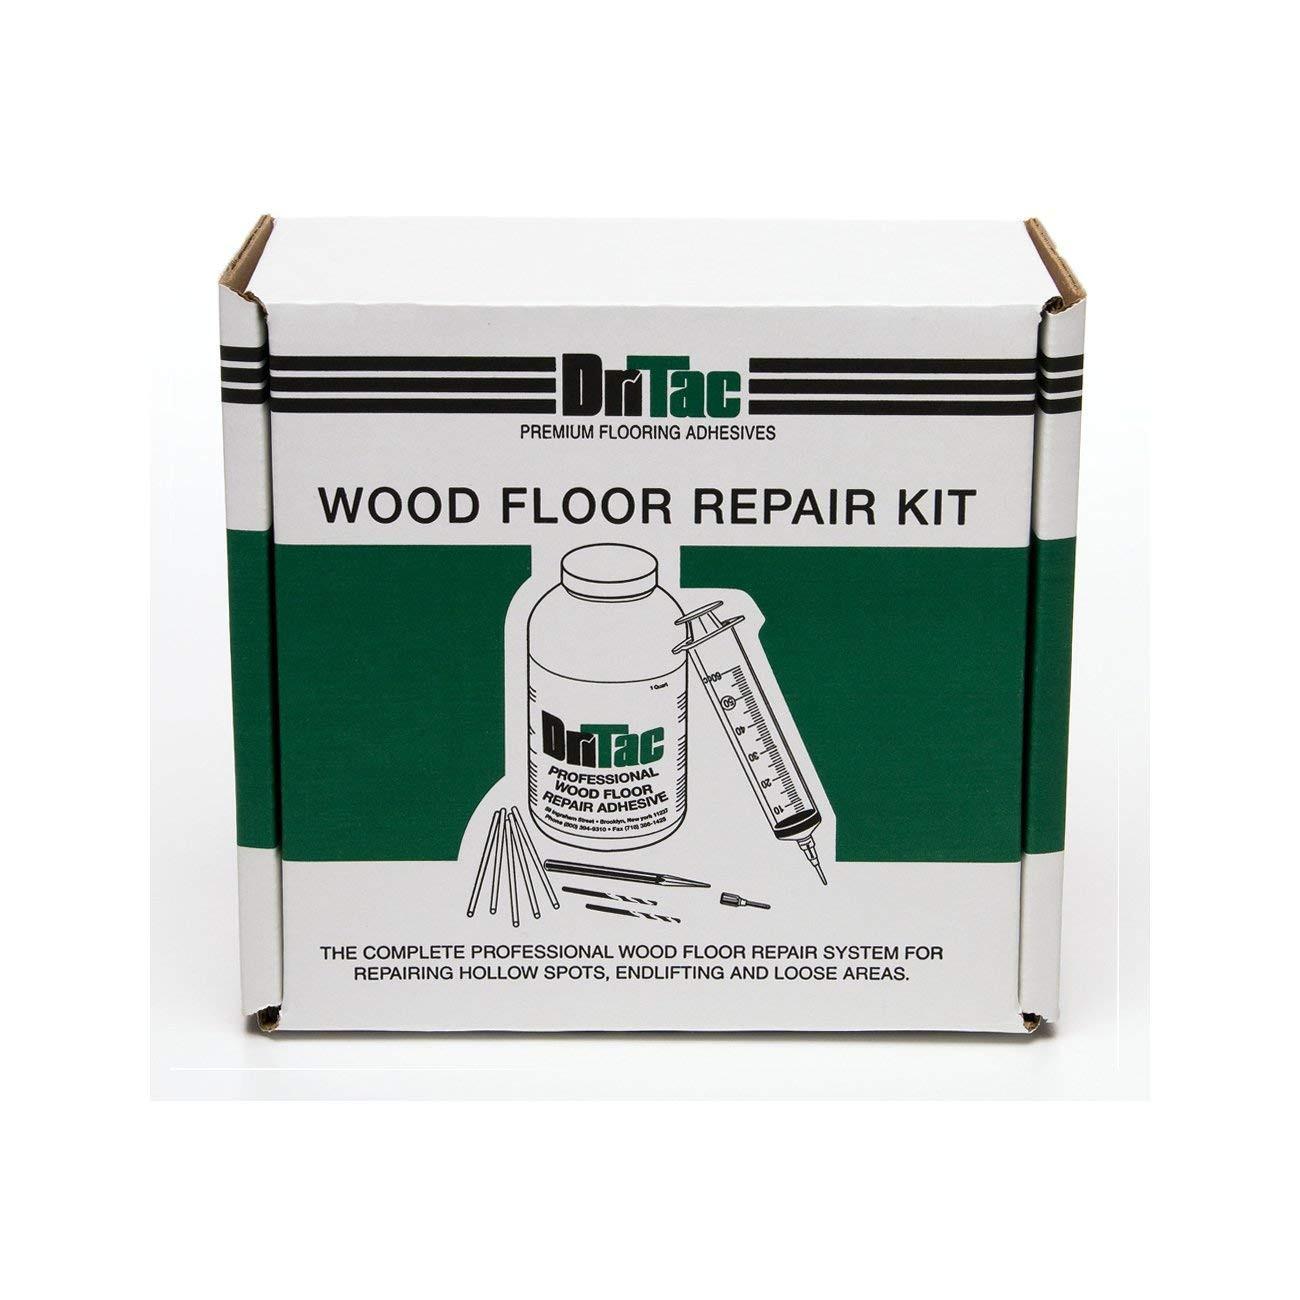 Hardwood Floor Putty Filler Of Amazon Com Dritac Wood Floor Repair Kit Engineered Flooring Only for Amazon Com Dritac Wood Floor Repair Kit Engineered Flooring Only 32oz Home Kitchen